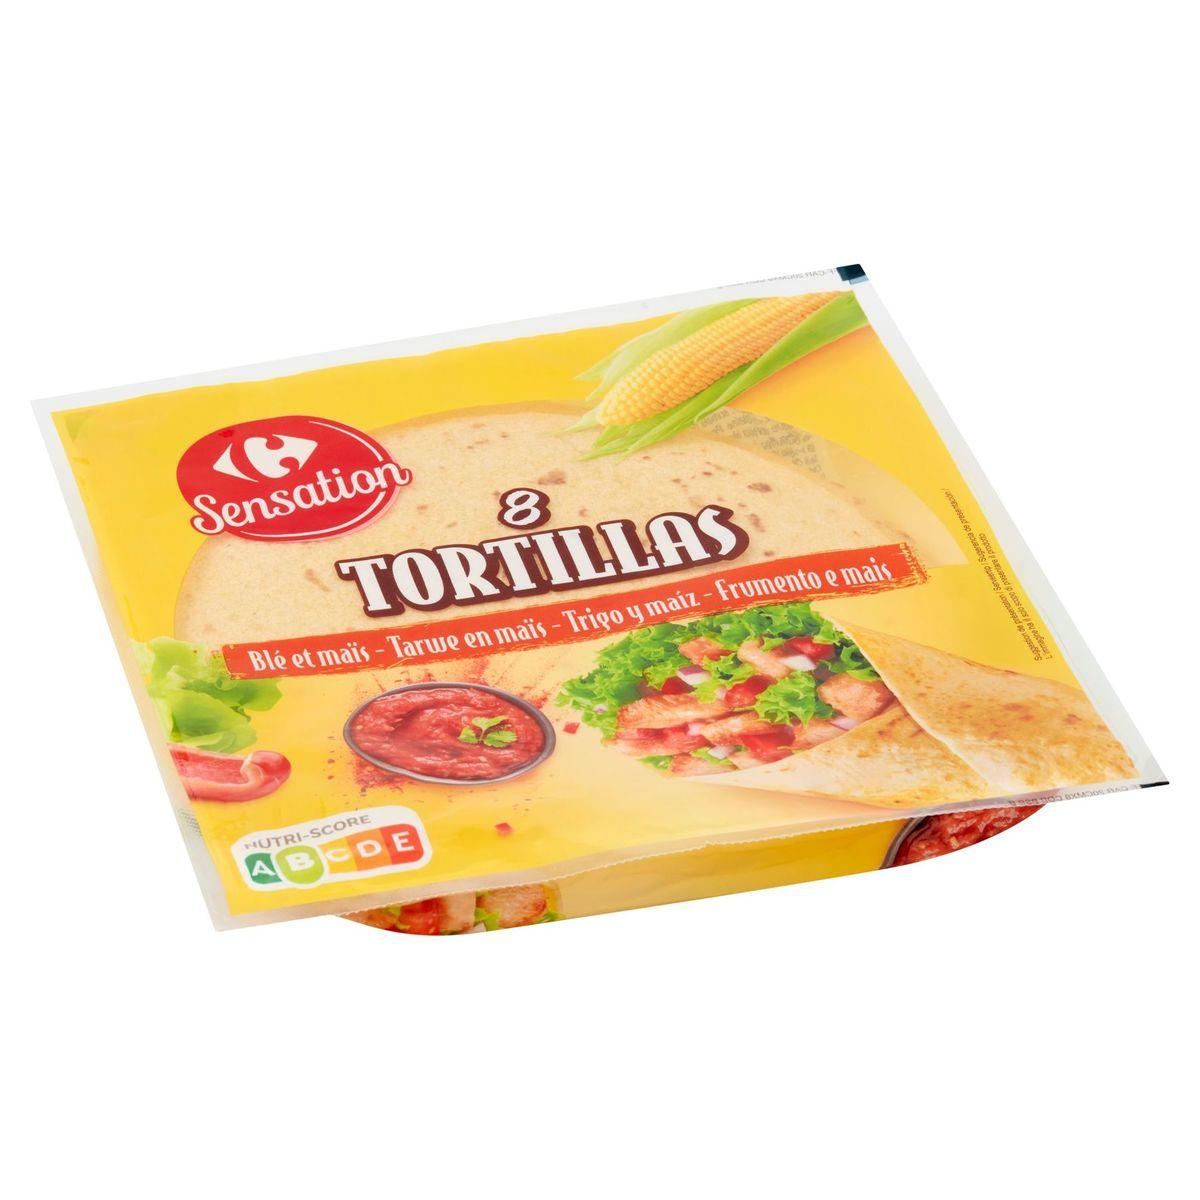 Carrefour Sensation Tortillas Tarwe en Maïs 8 Stuks 320 g